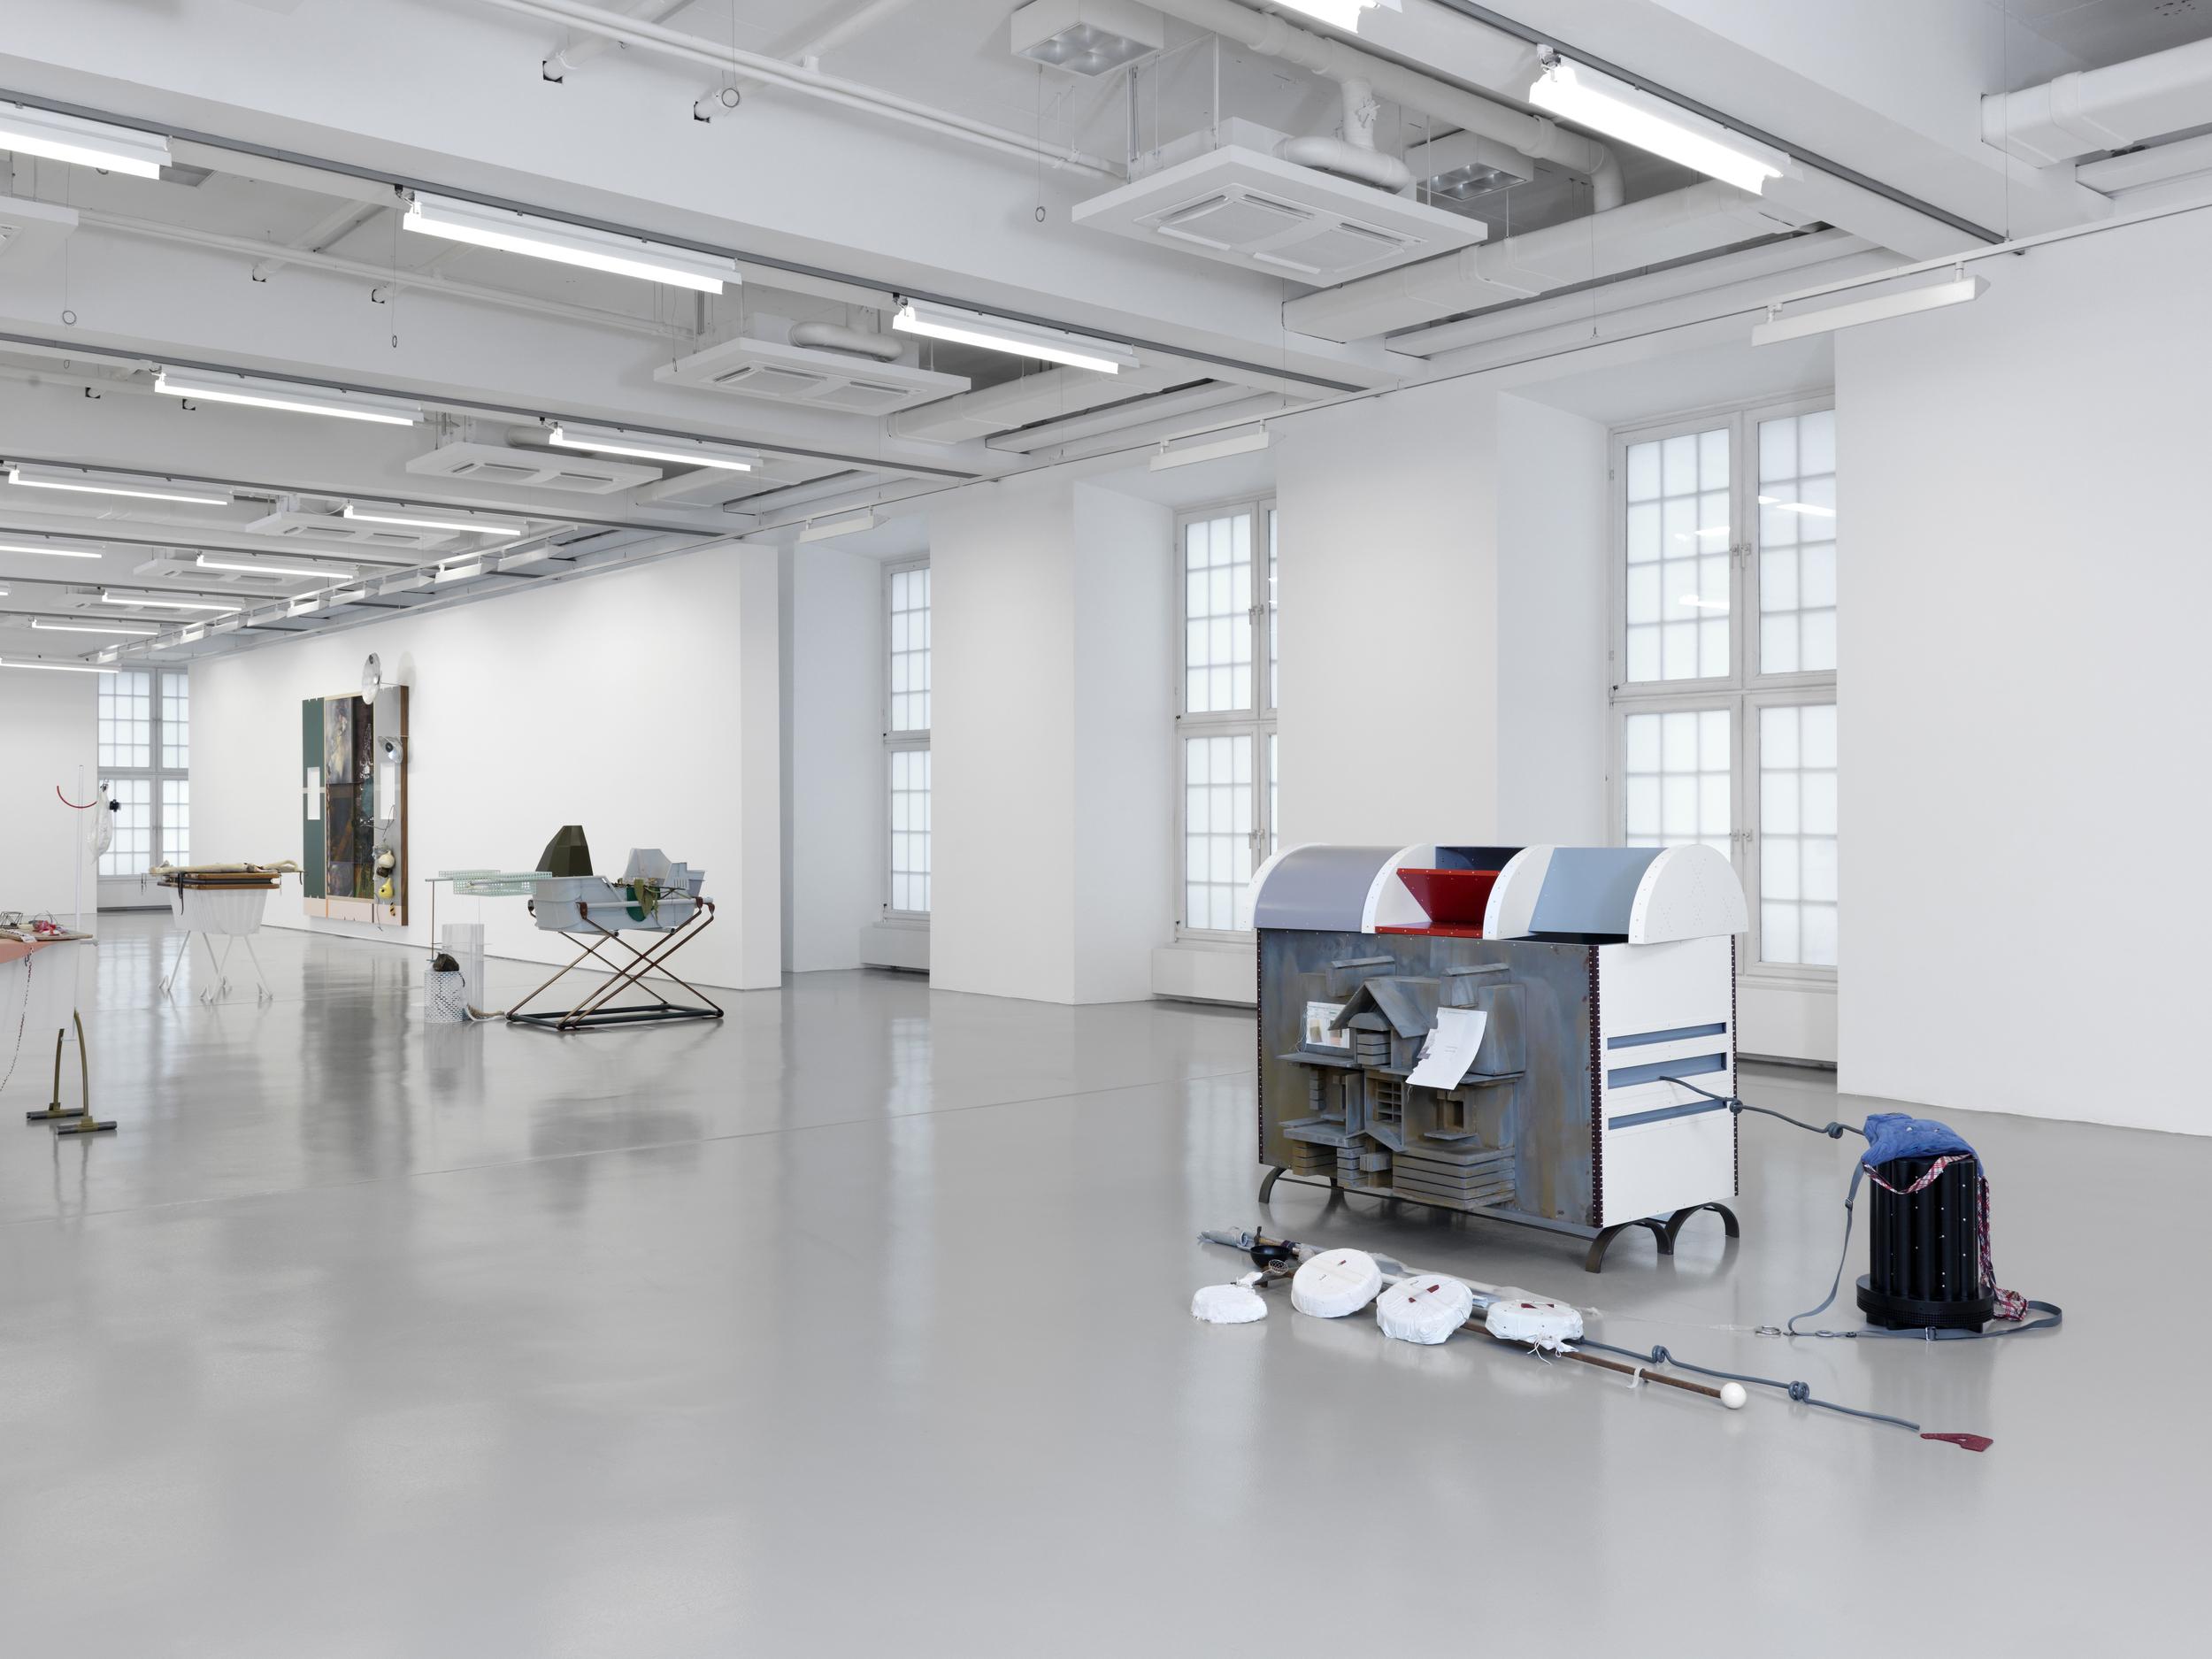 Fridericianum, Kassel | Helen Marten | 2014